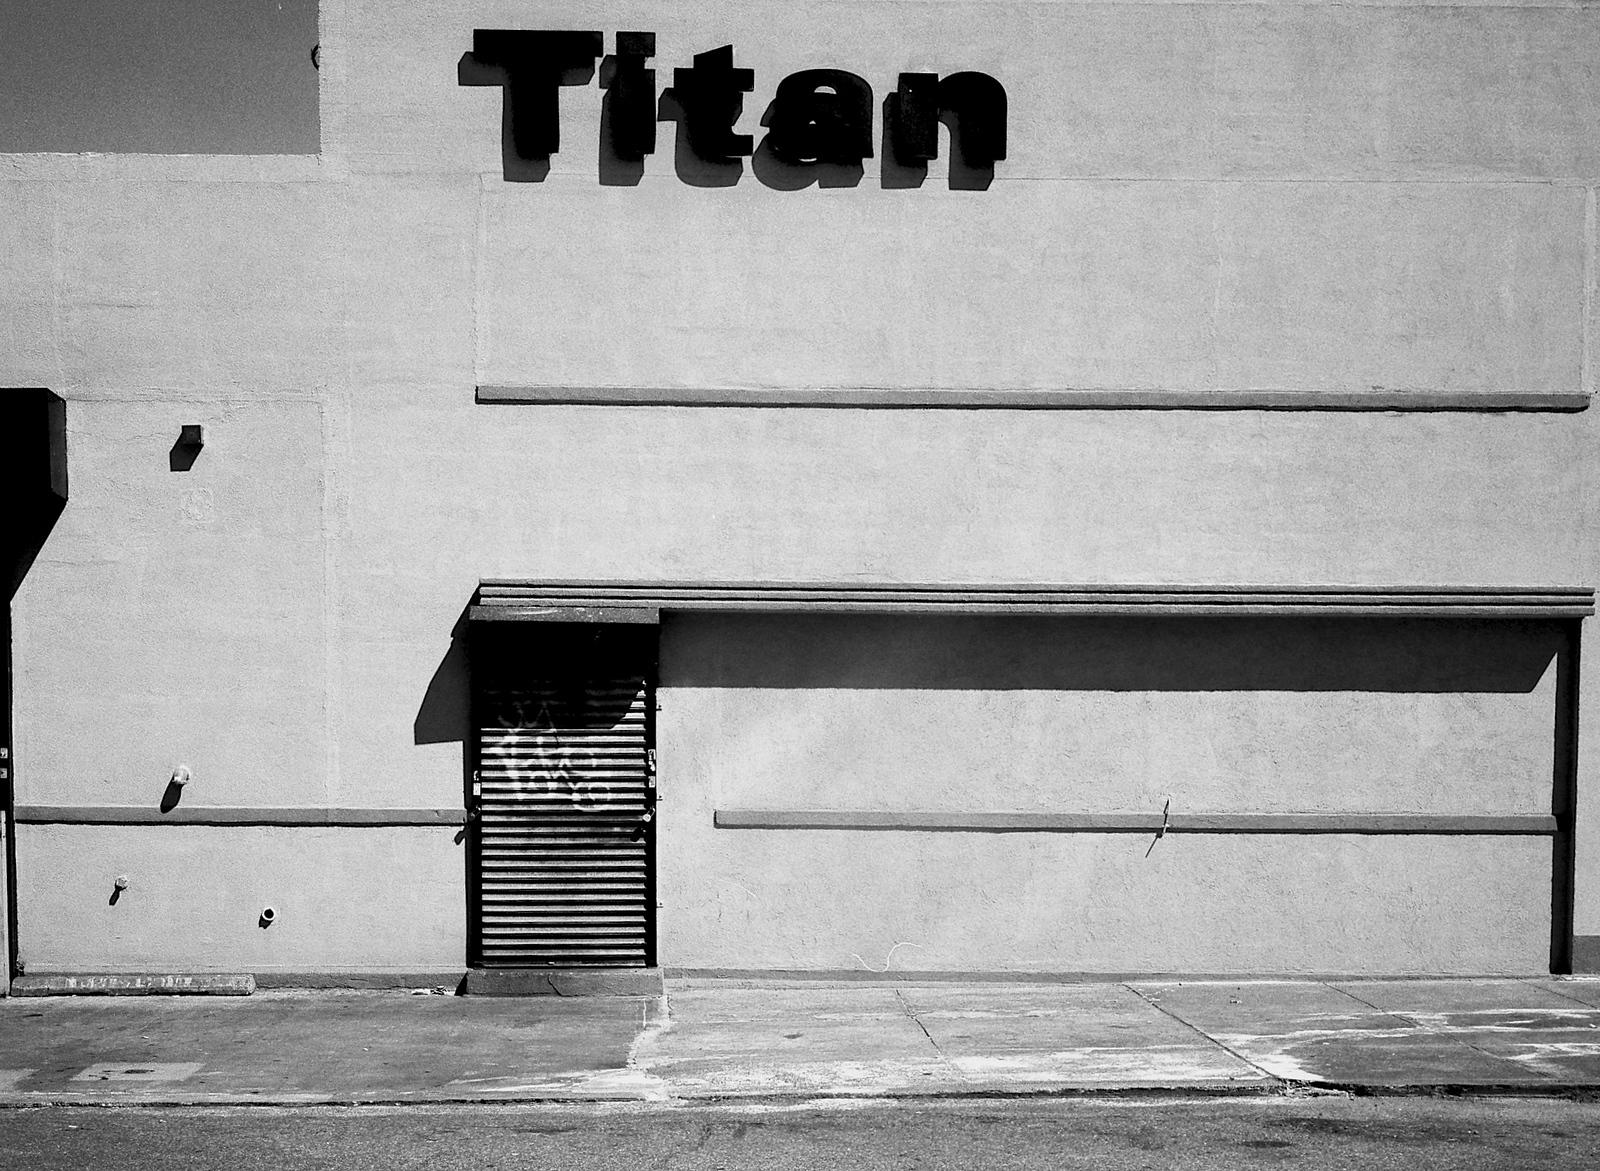 Titan Machine Corp